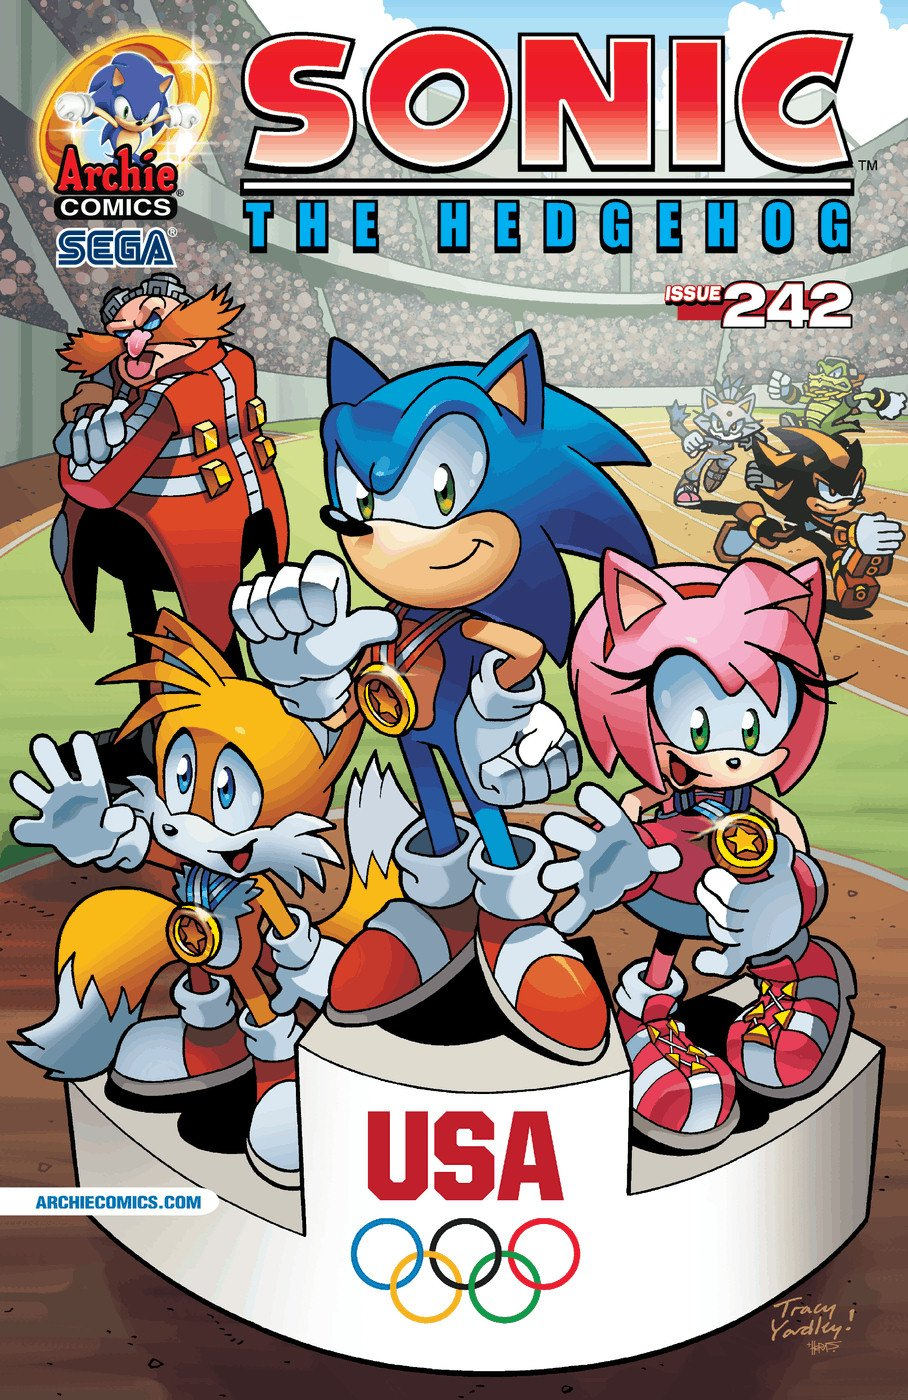 Sonic the Hedgehog 242 (December 2012)